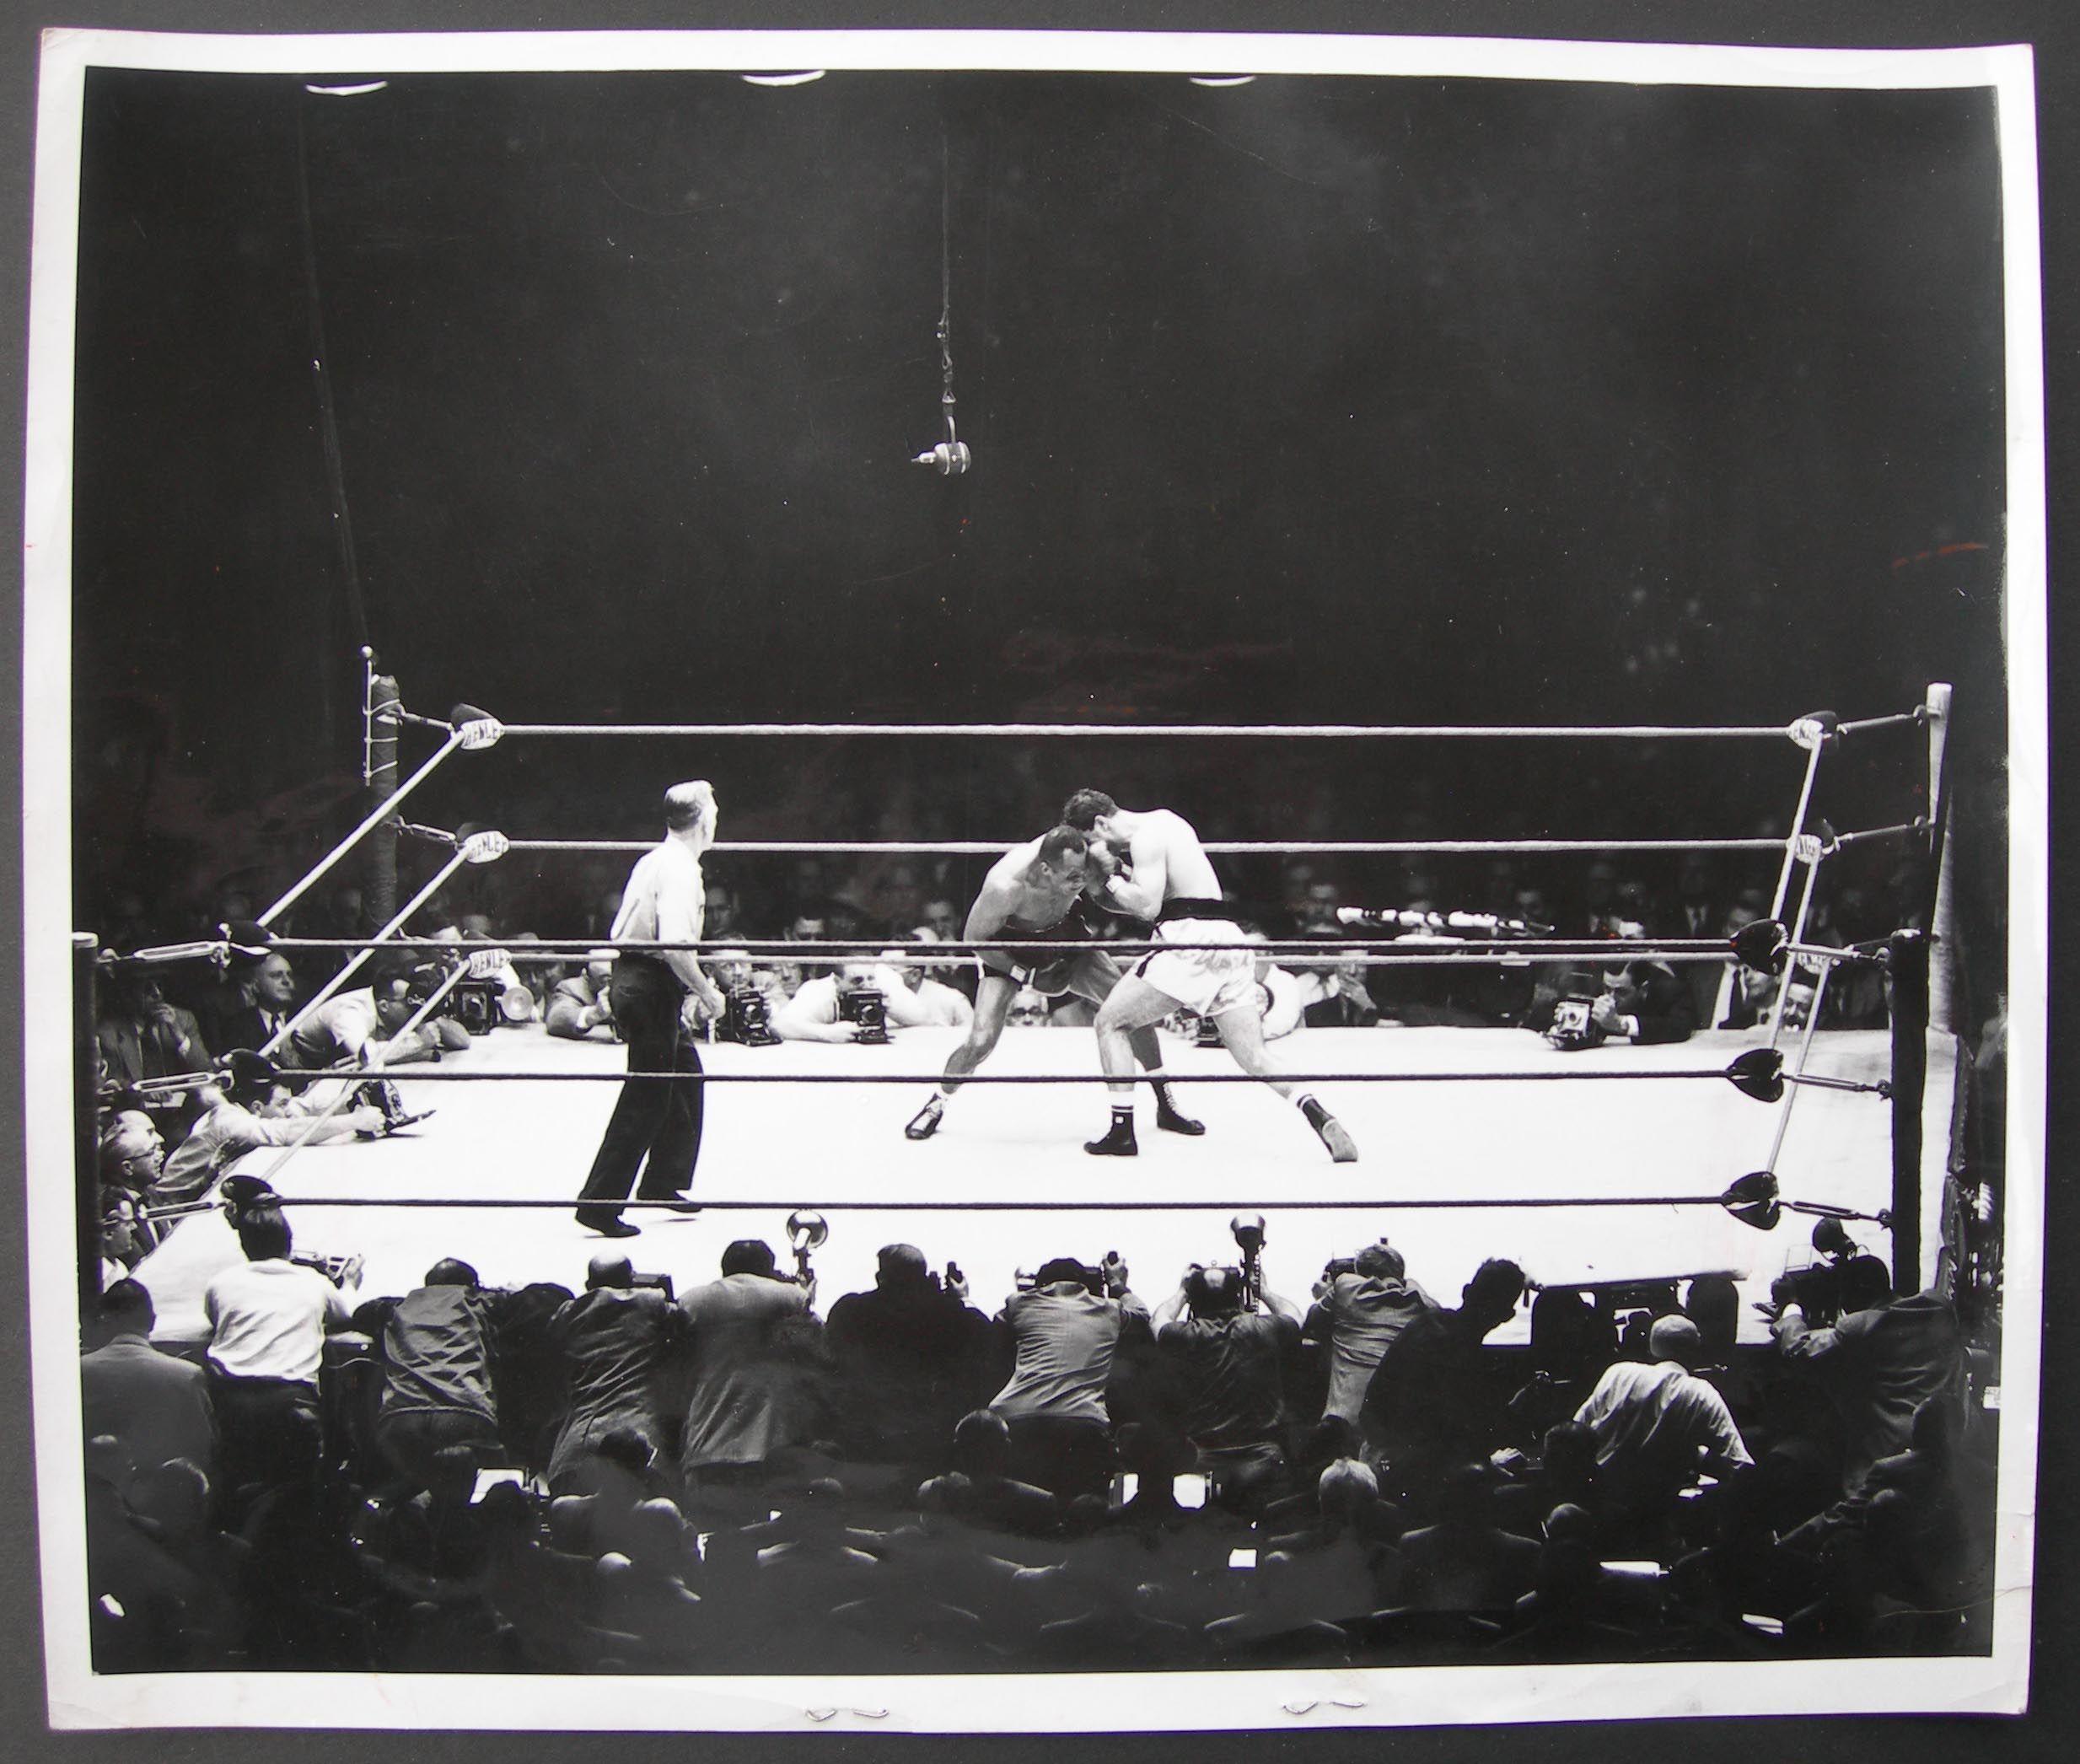 International Boxing Club Alternative Dispute Resolution Dispute Boxing Club